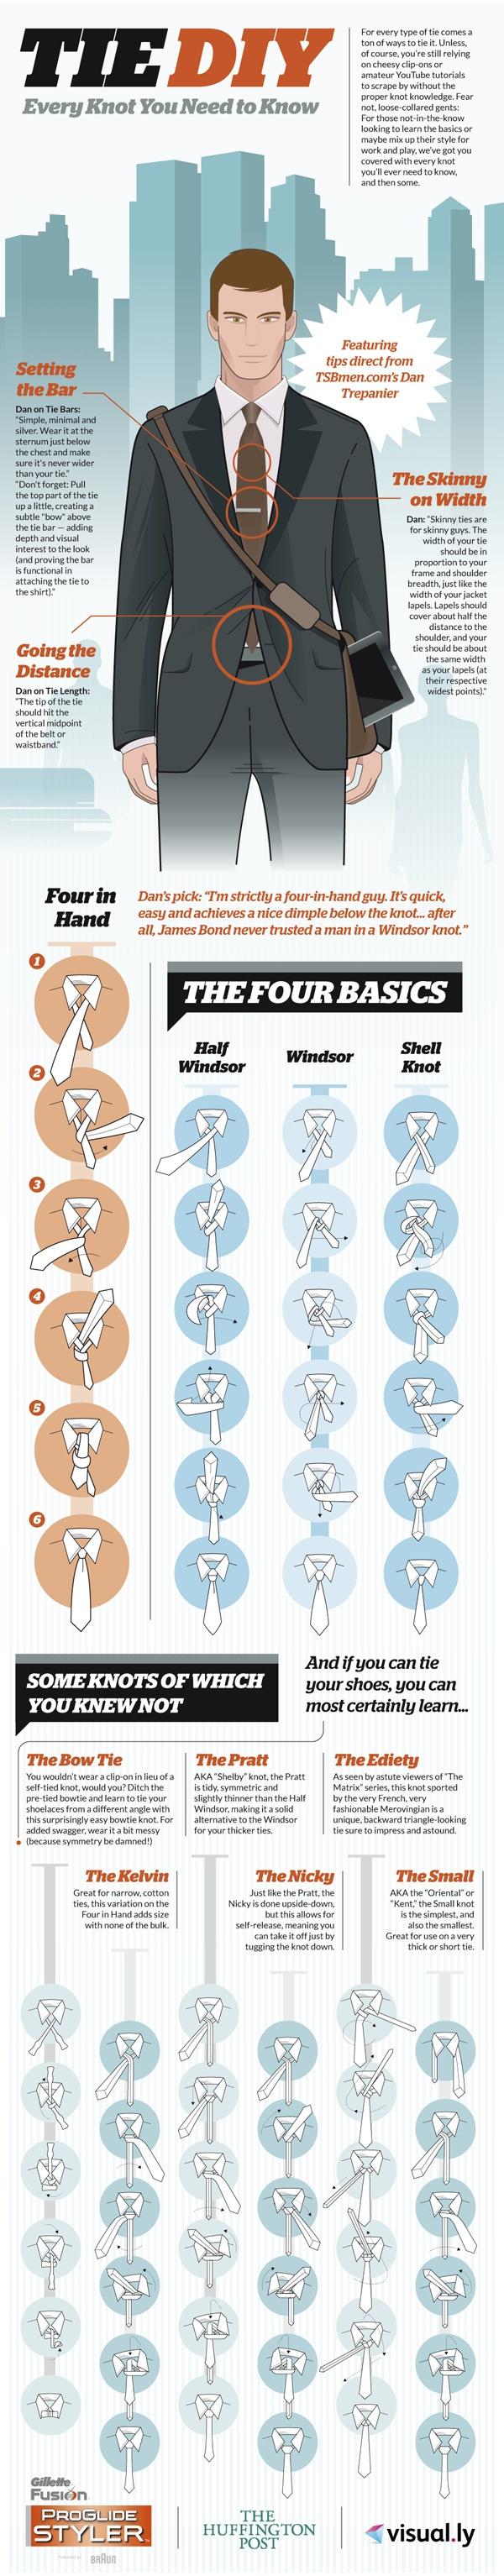 Todo lo que debes saber sobre la corbata #infografia#infographic